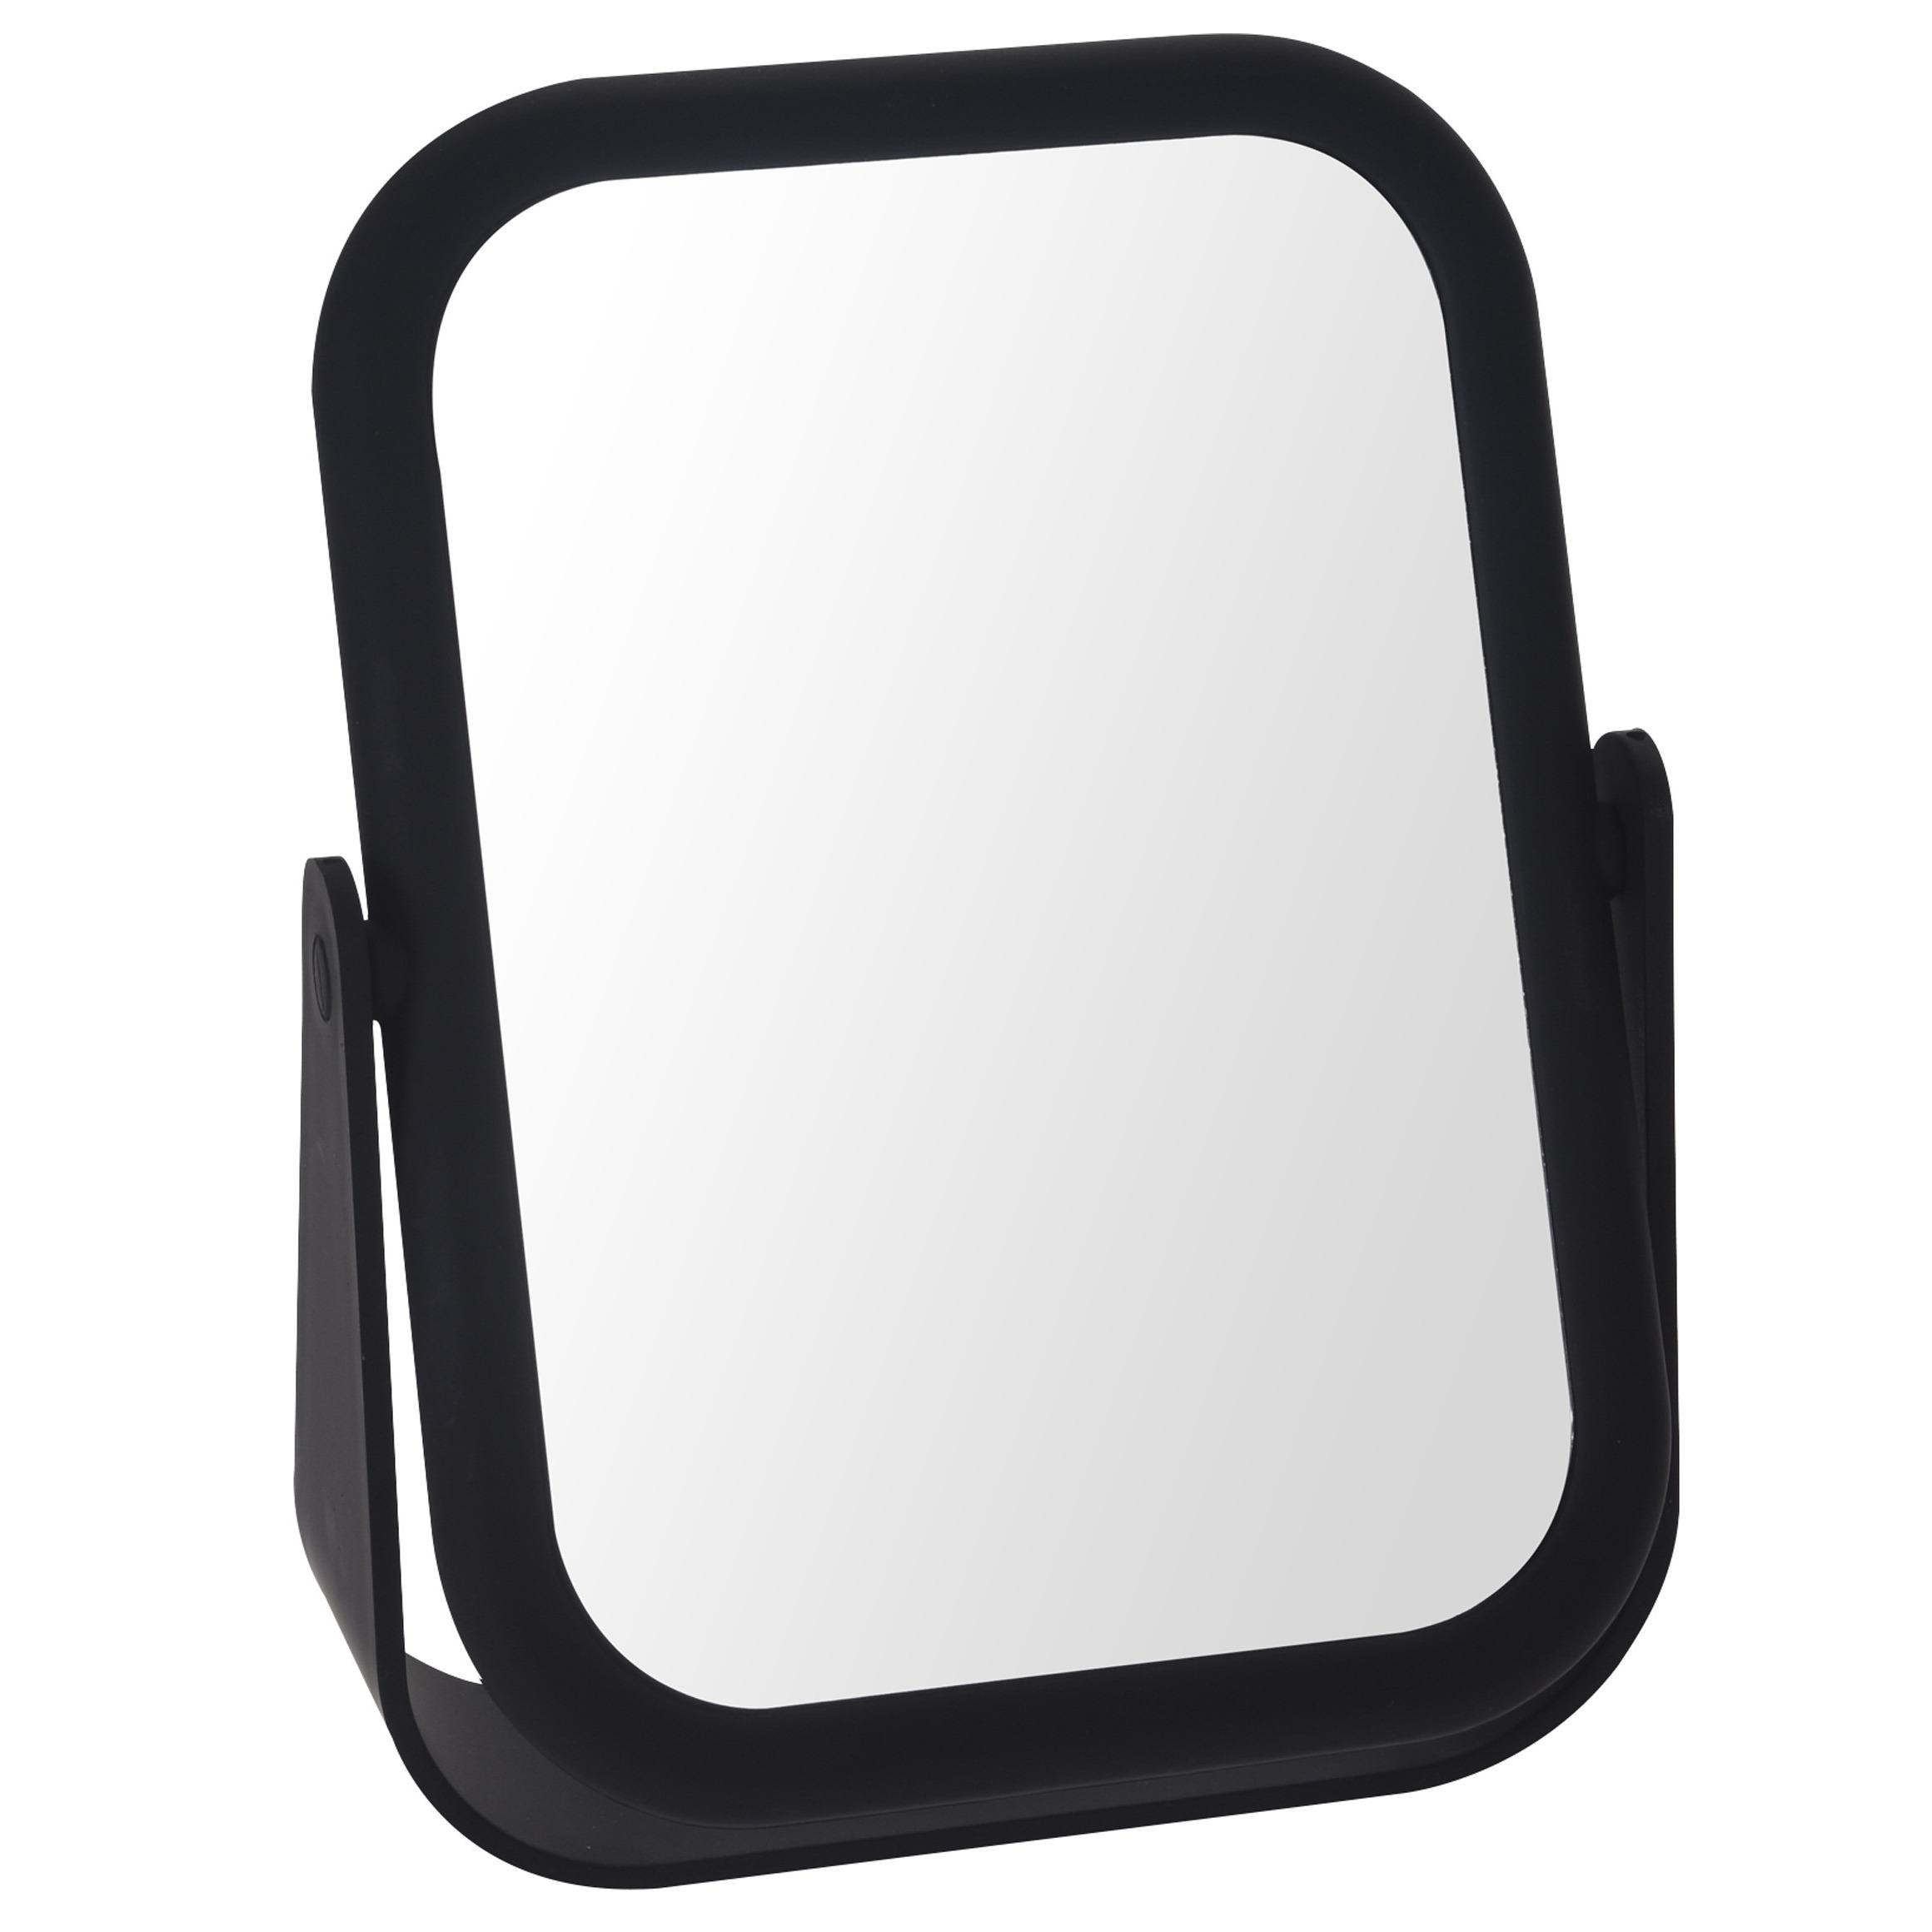 Zwarte make-up spiegel rechthoek dubbelzijdig 15 x 21 cm